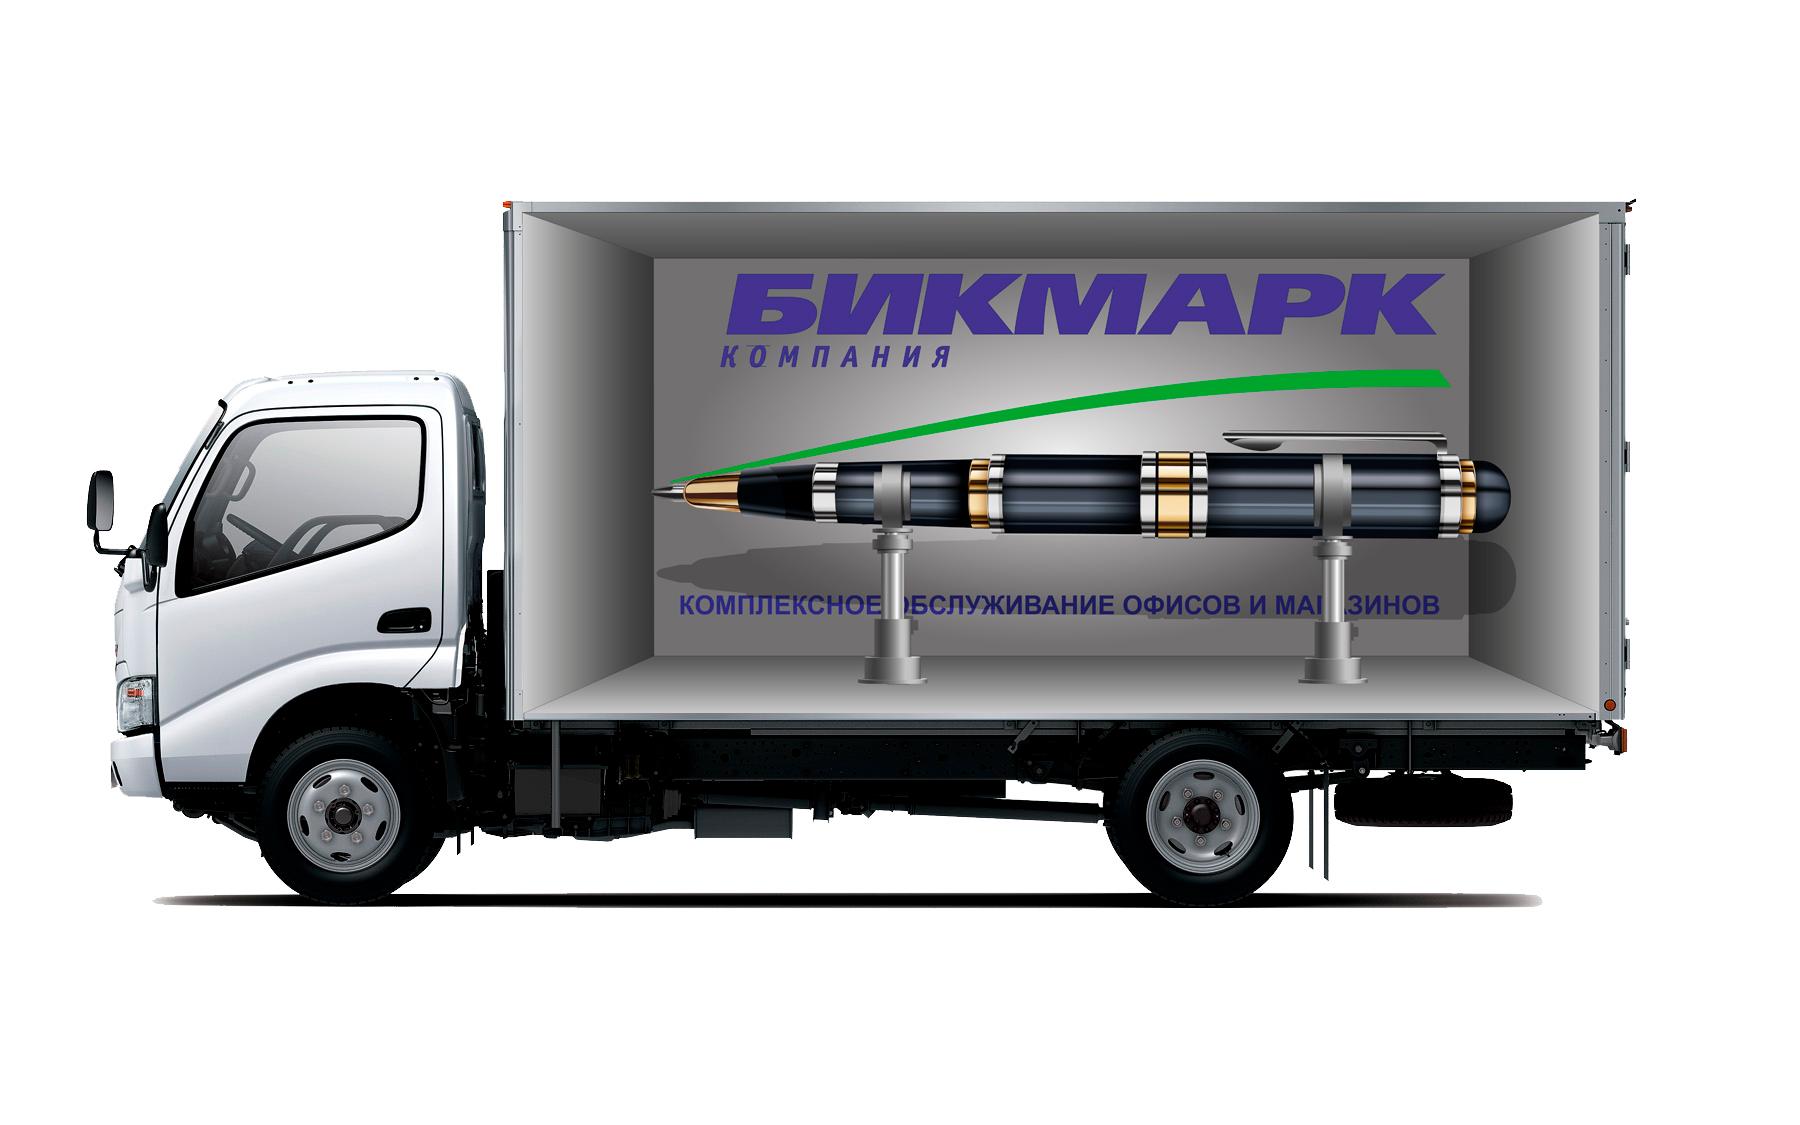 Разработка  рекламы на грузовые машины фото f_6825b2eb2e5cc791.jpg